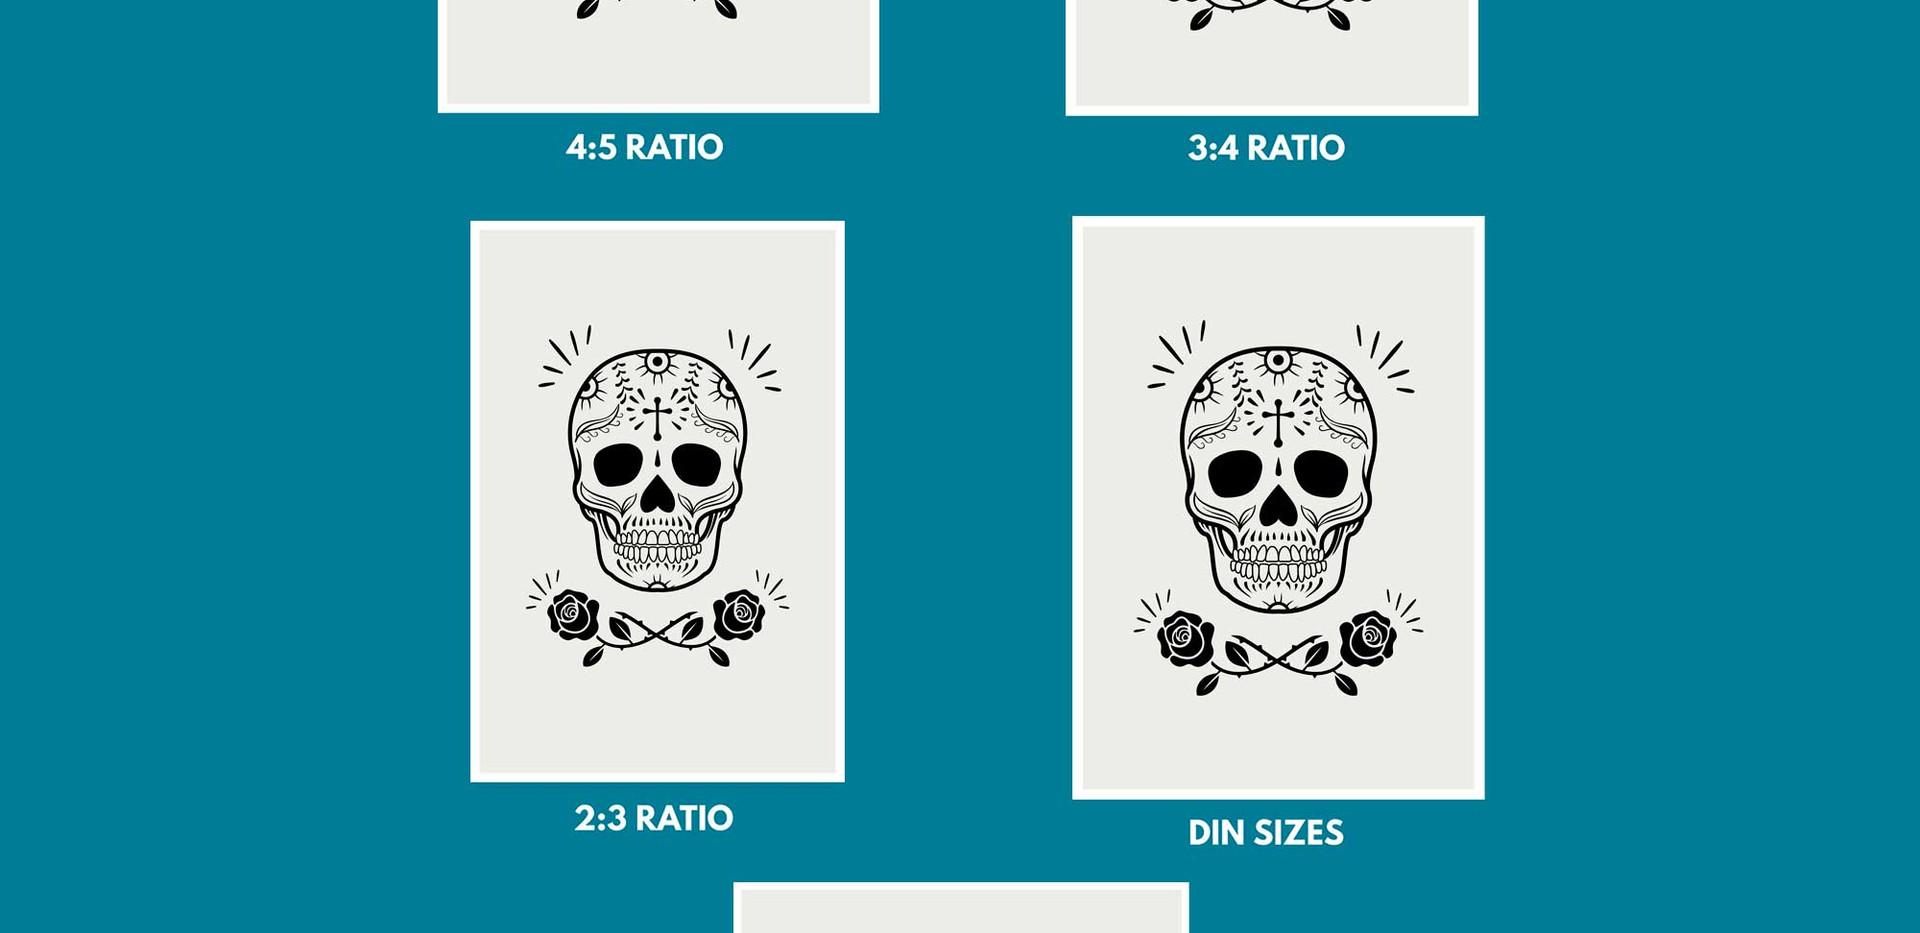 Printable Sizes Information